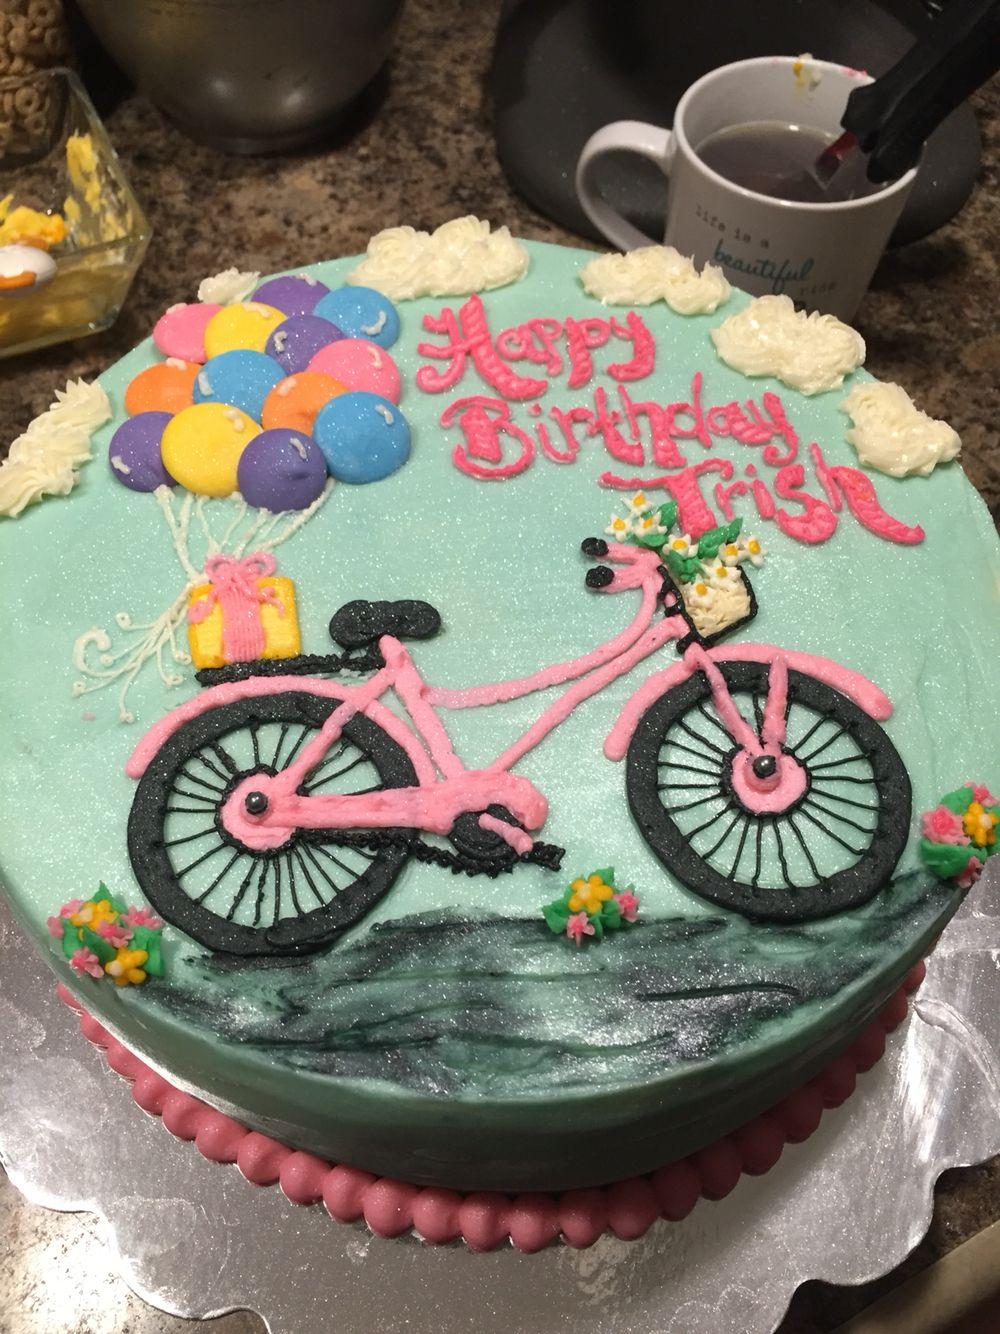 Bicycle Balloon Cake My Sweet Enchantments Pinterest Balloon Cake